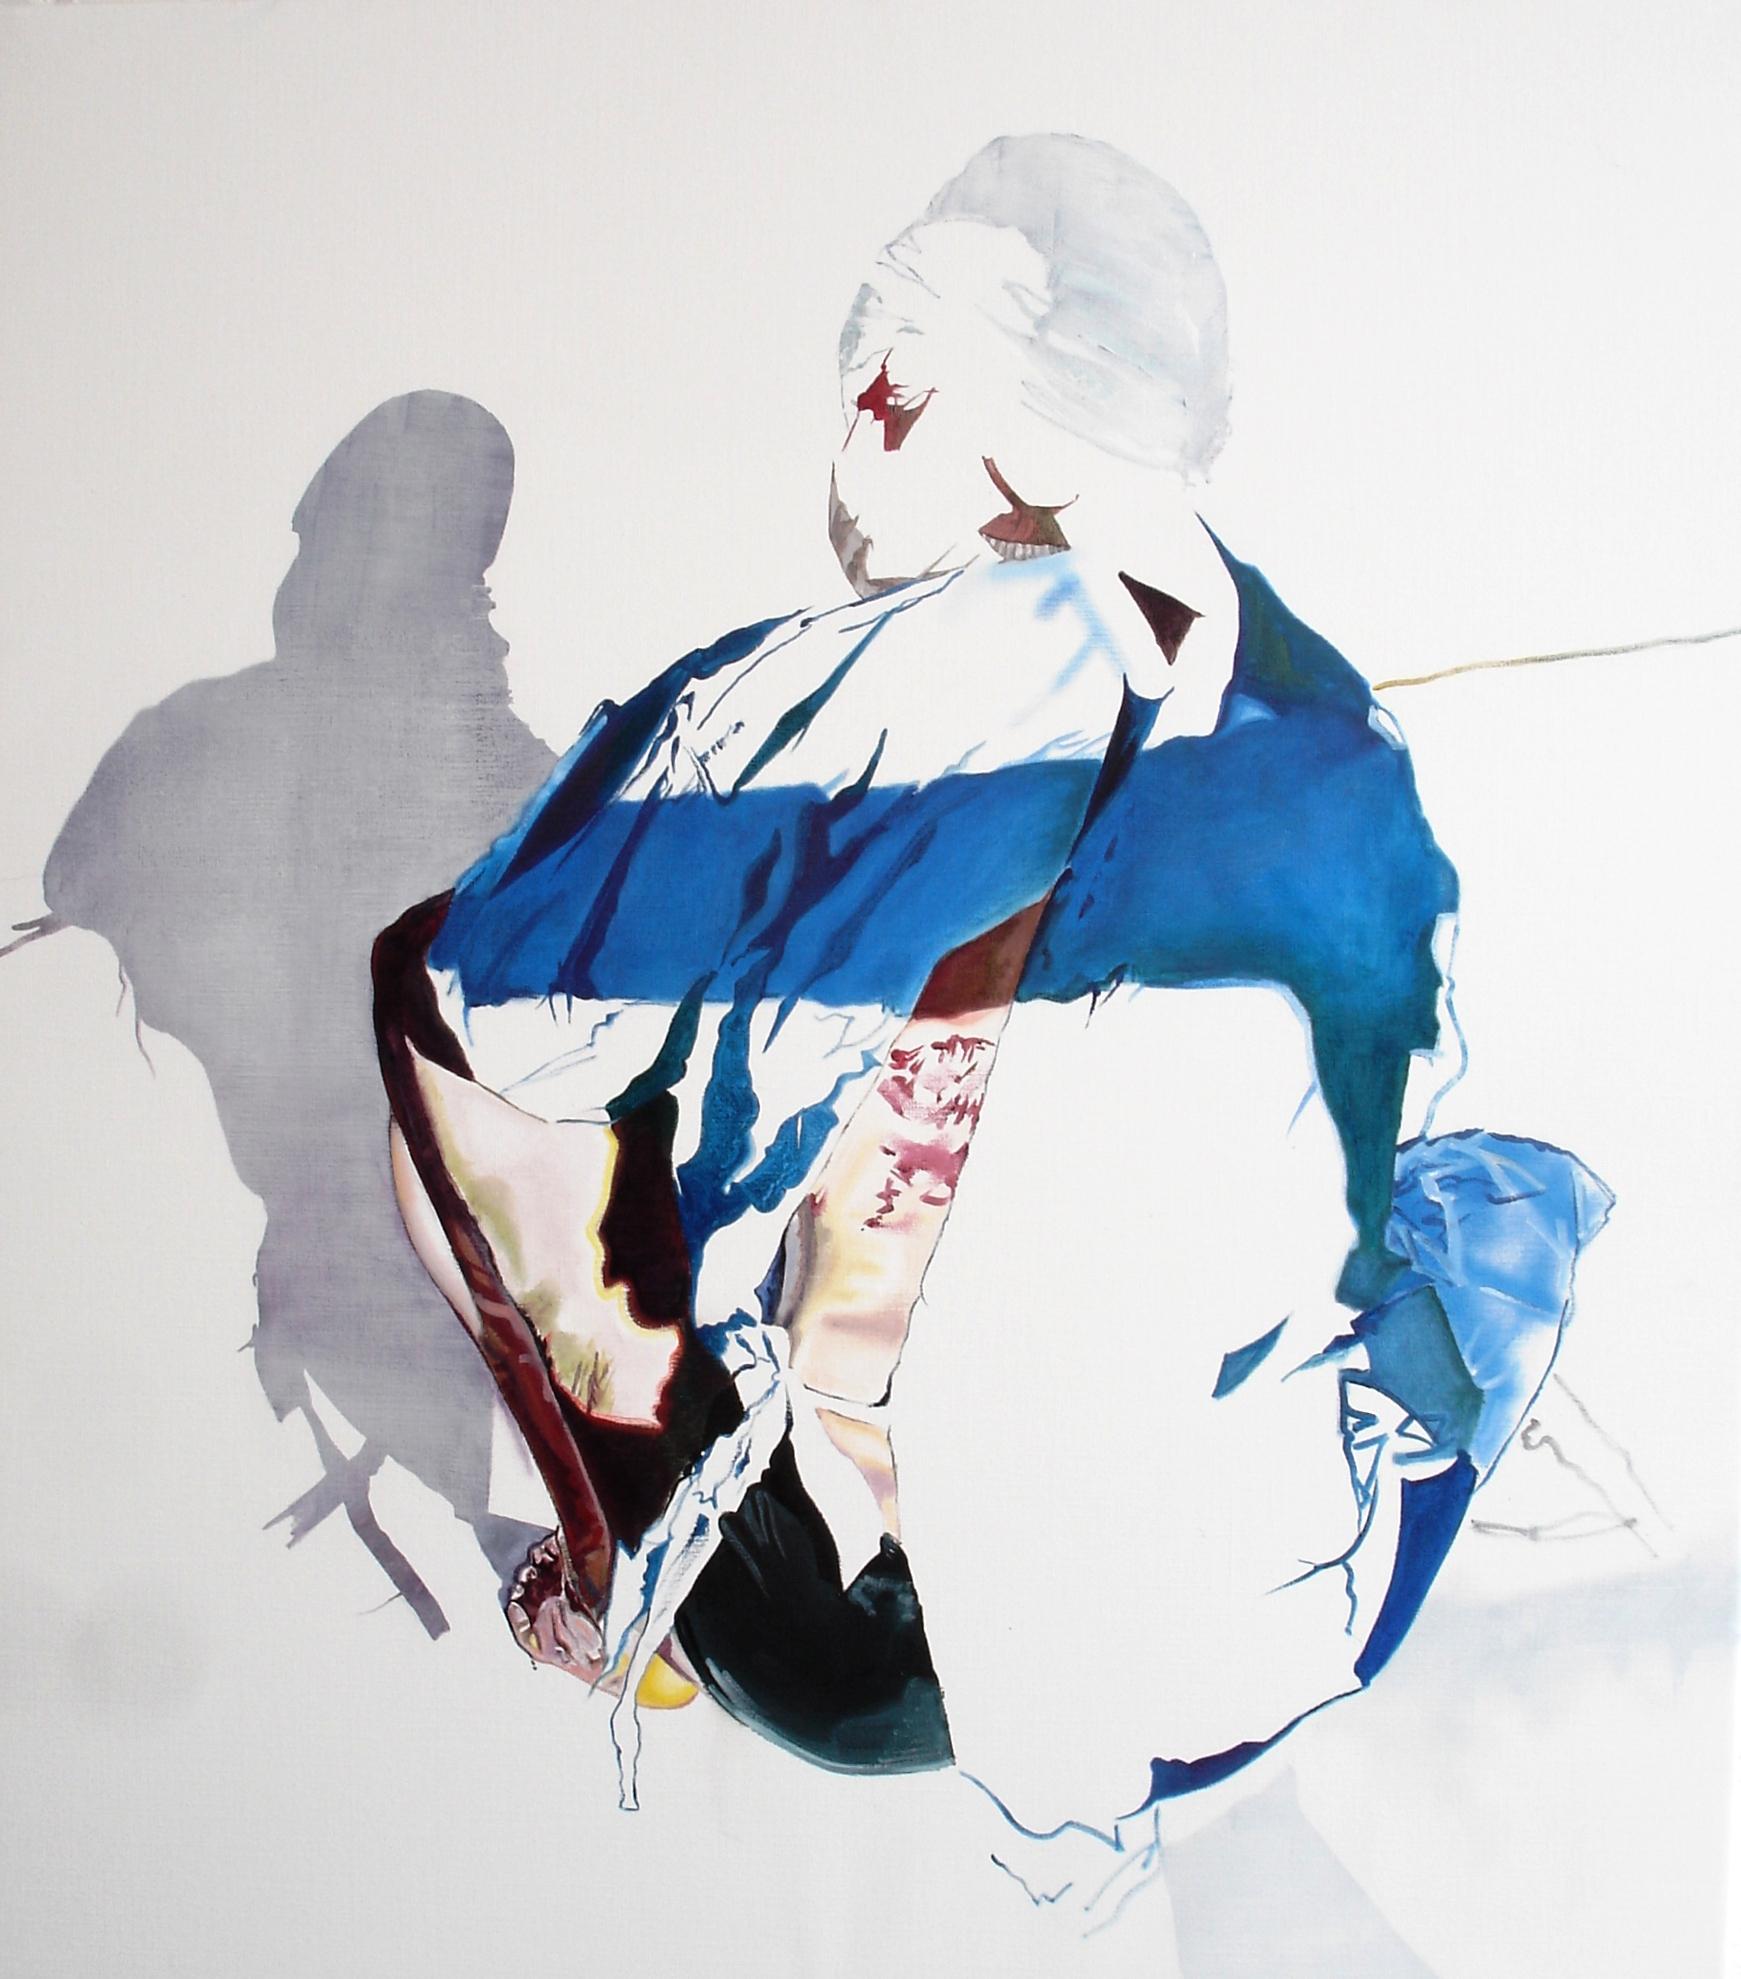 Wouter van de Koot painting man surgeon mask blue crouching shadow